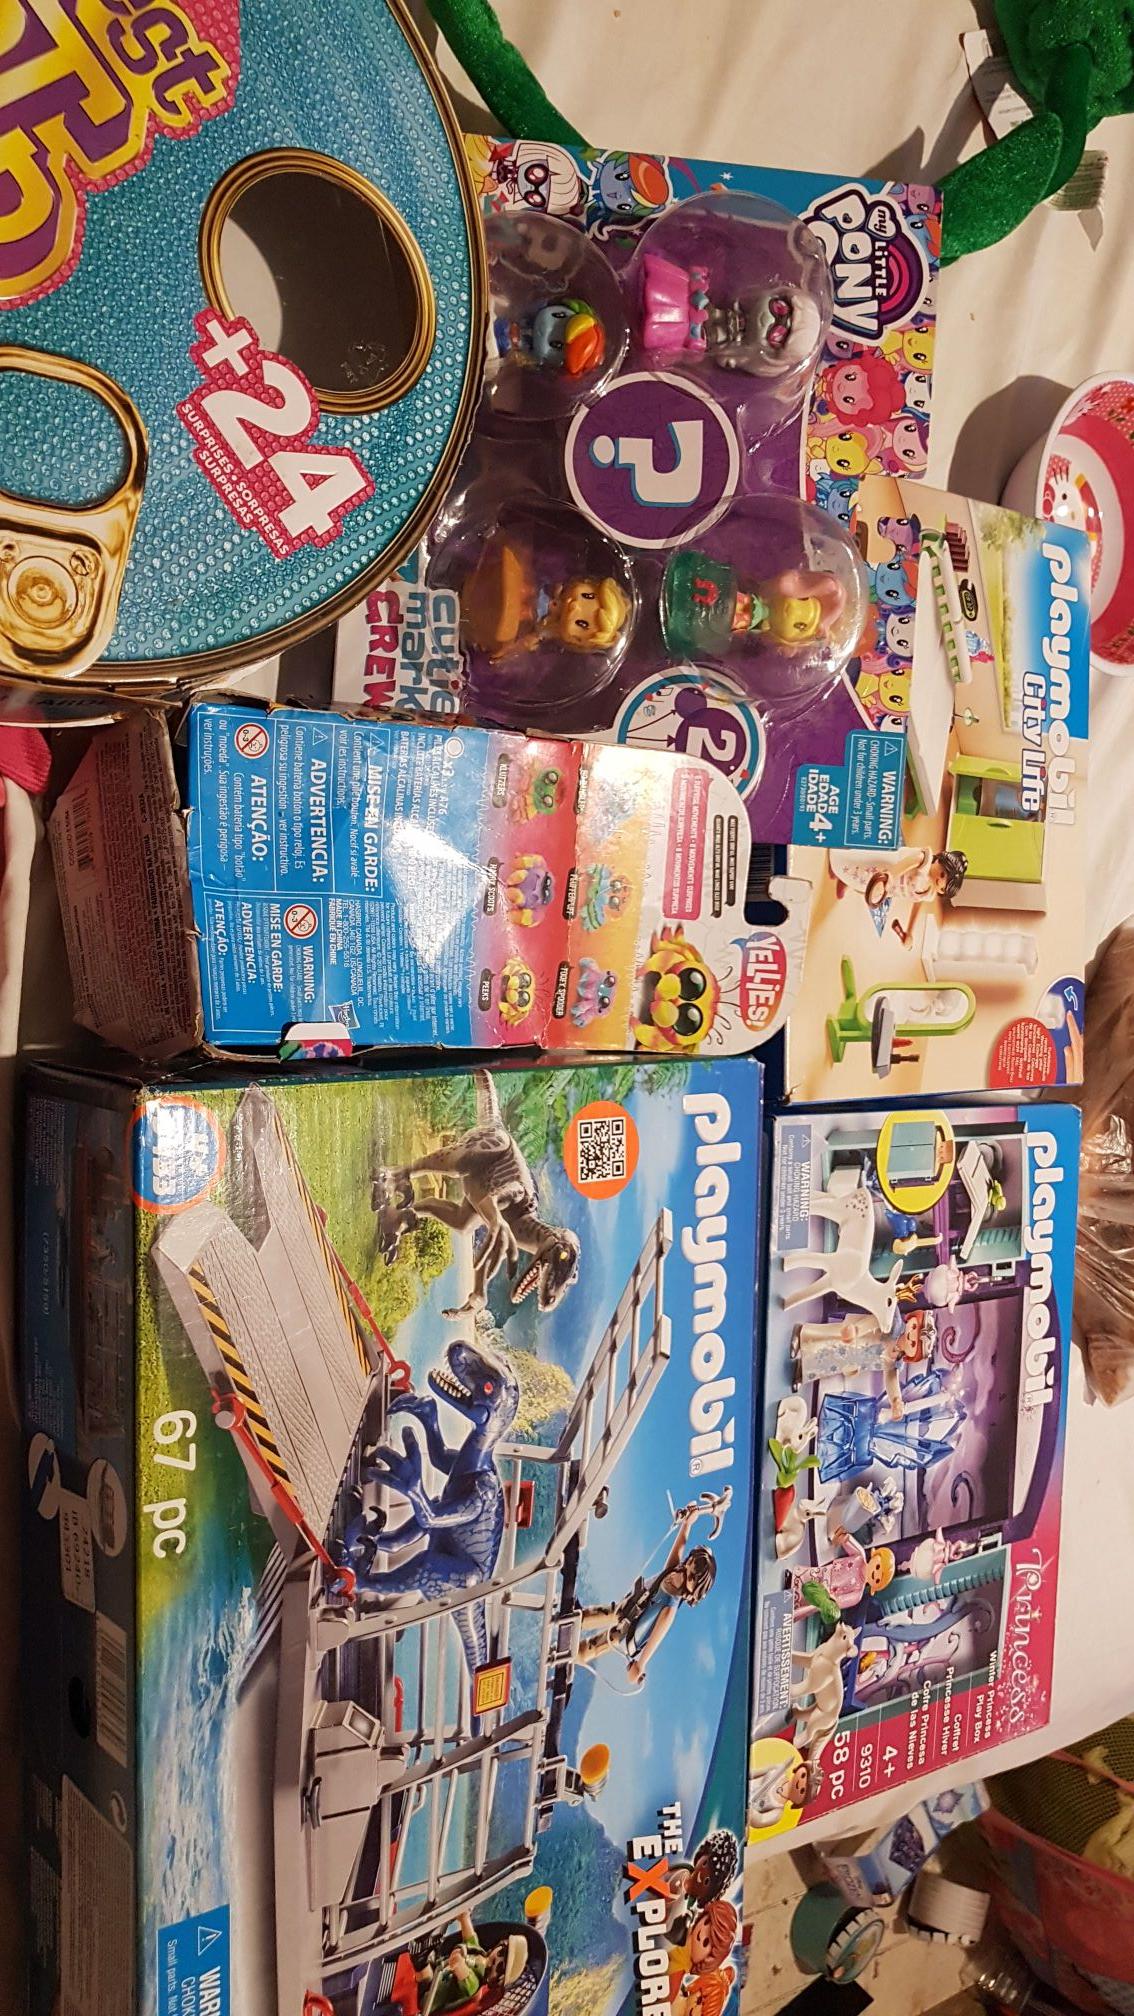 Bodega Aurrera Santa Rosa: Playmobil princess, playmobil city life y más...